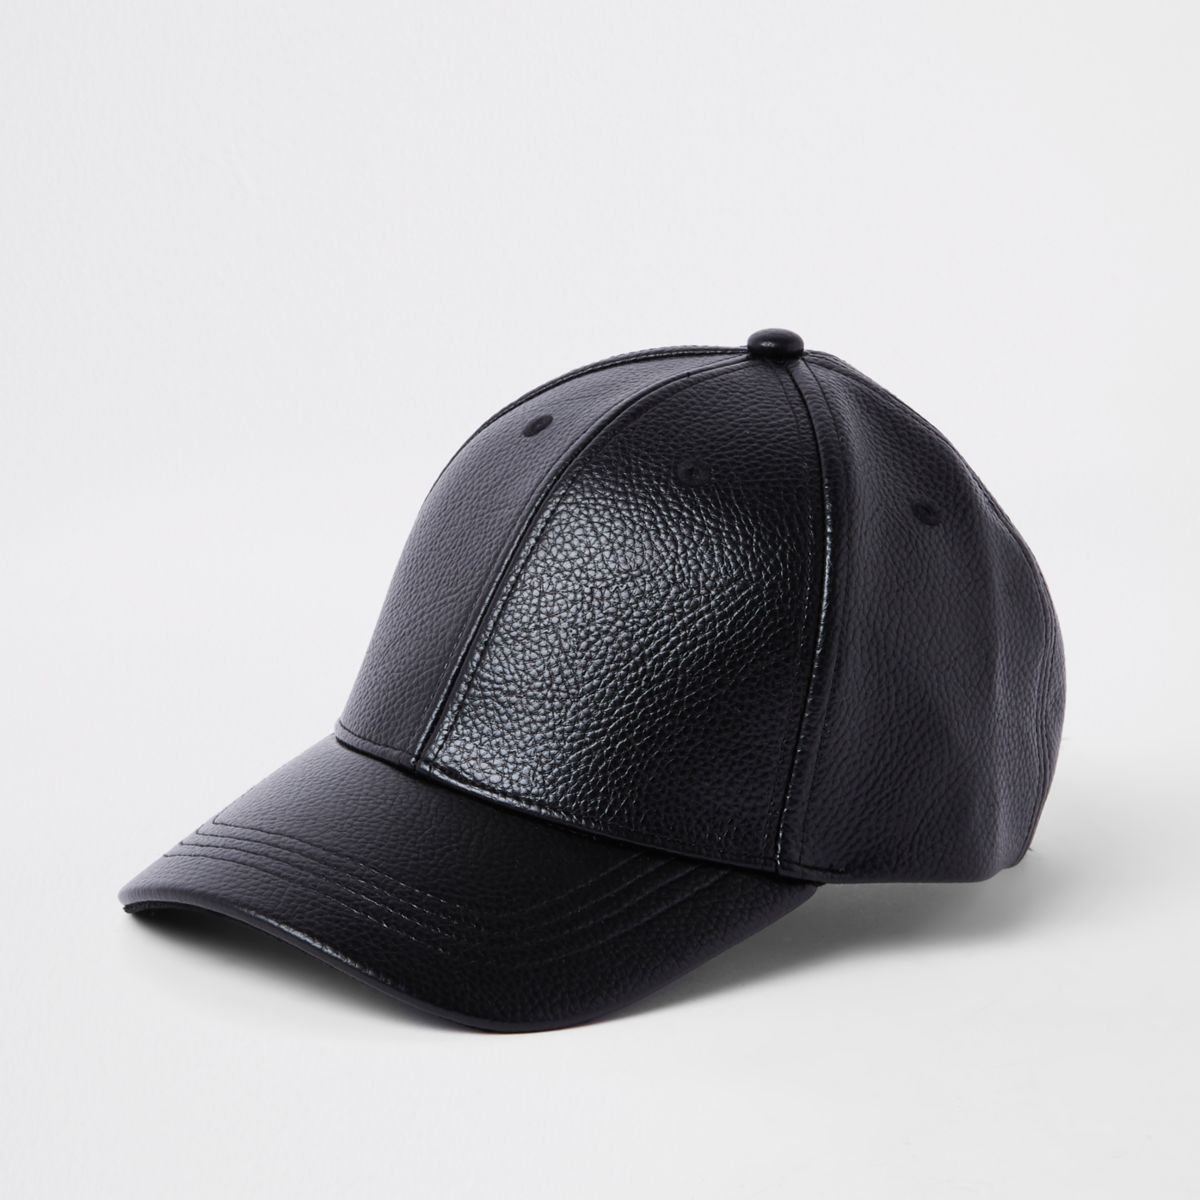 Black faux leather baseball cap